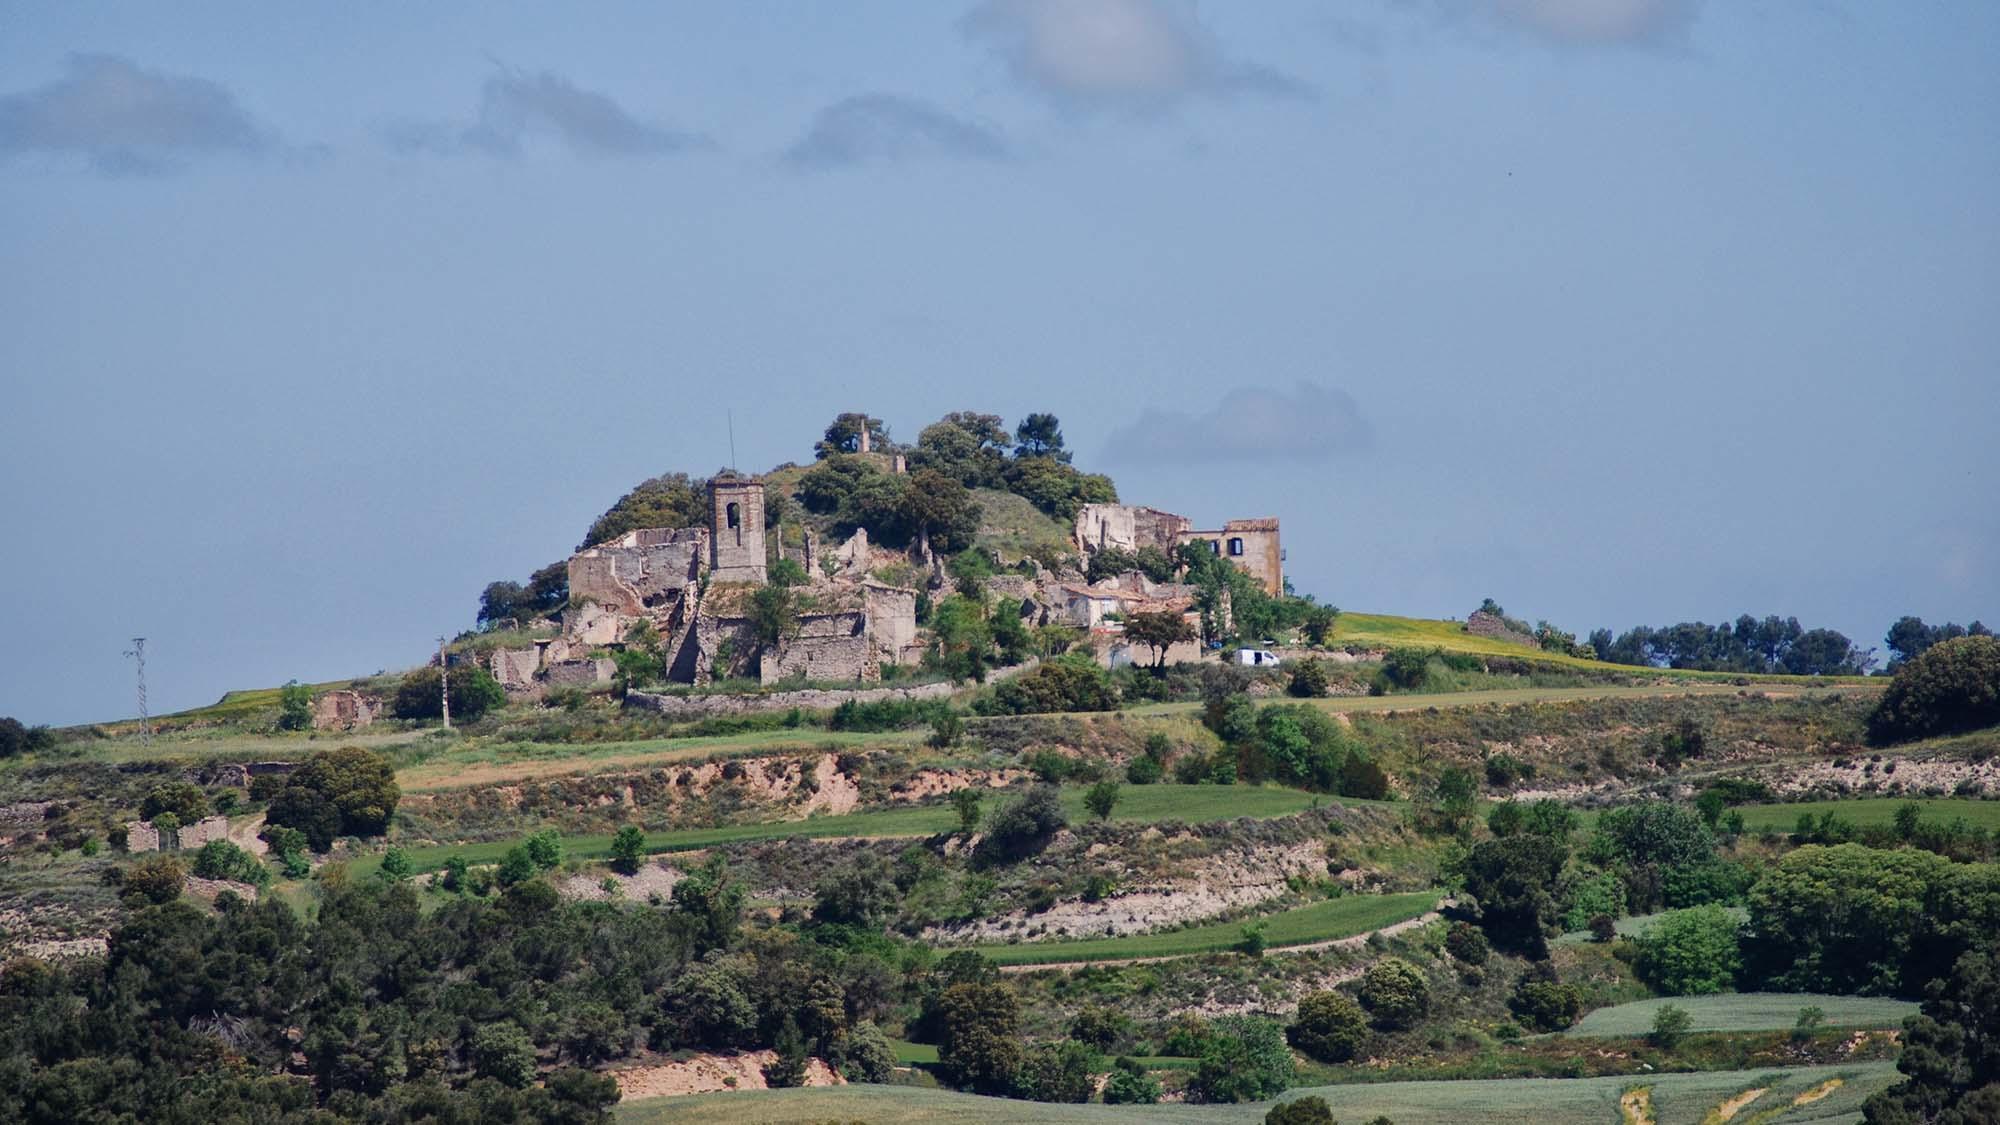 Castillo de Montlleó